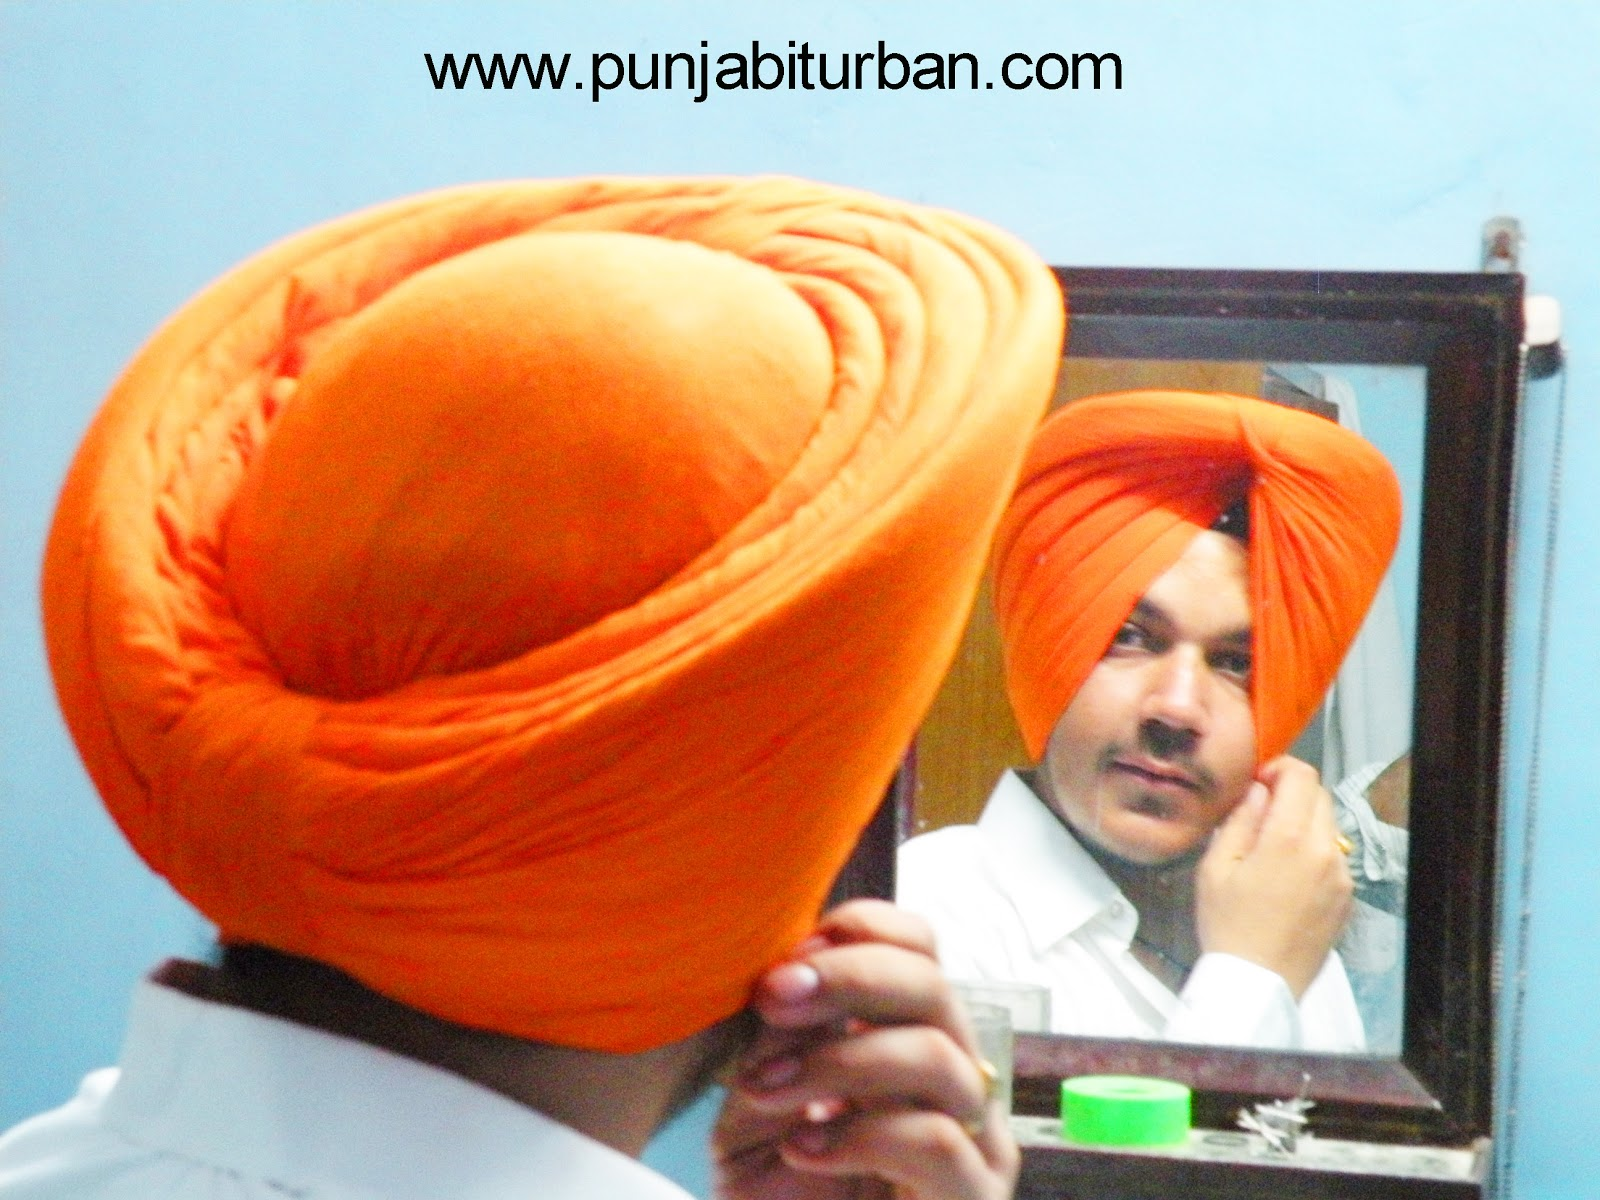 Patiala shahi turban fans pagg